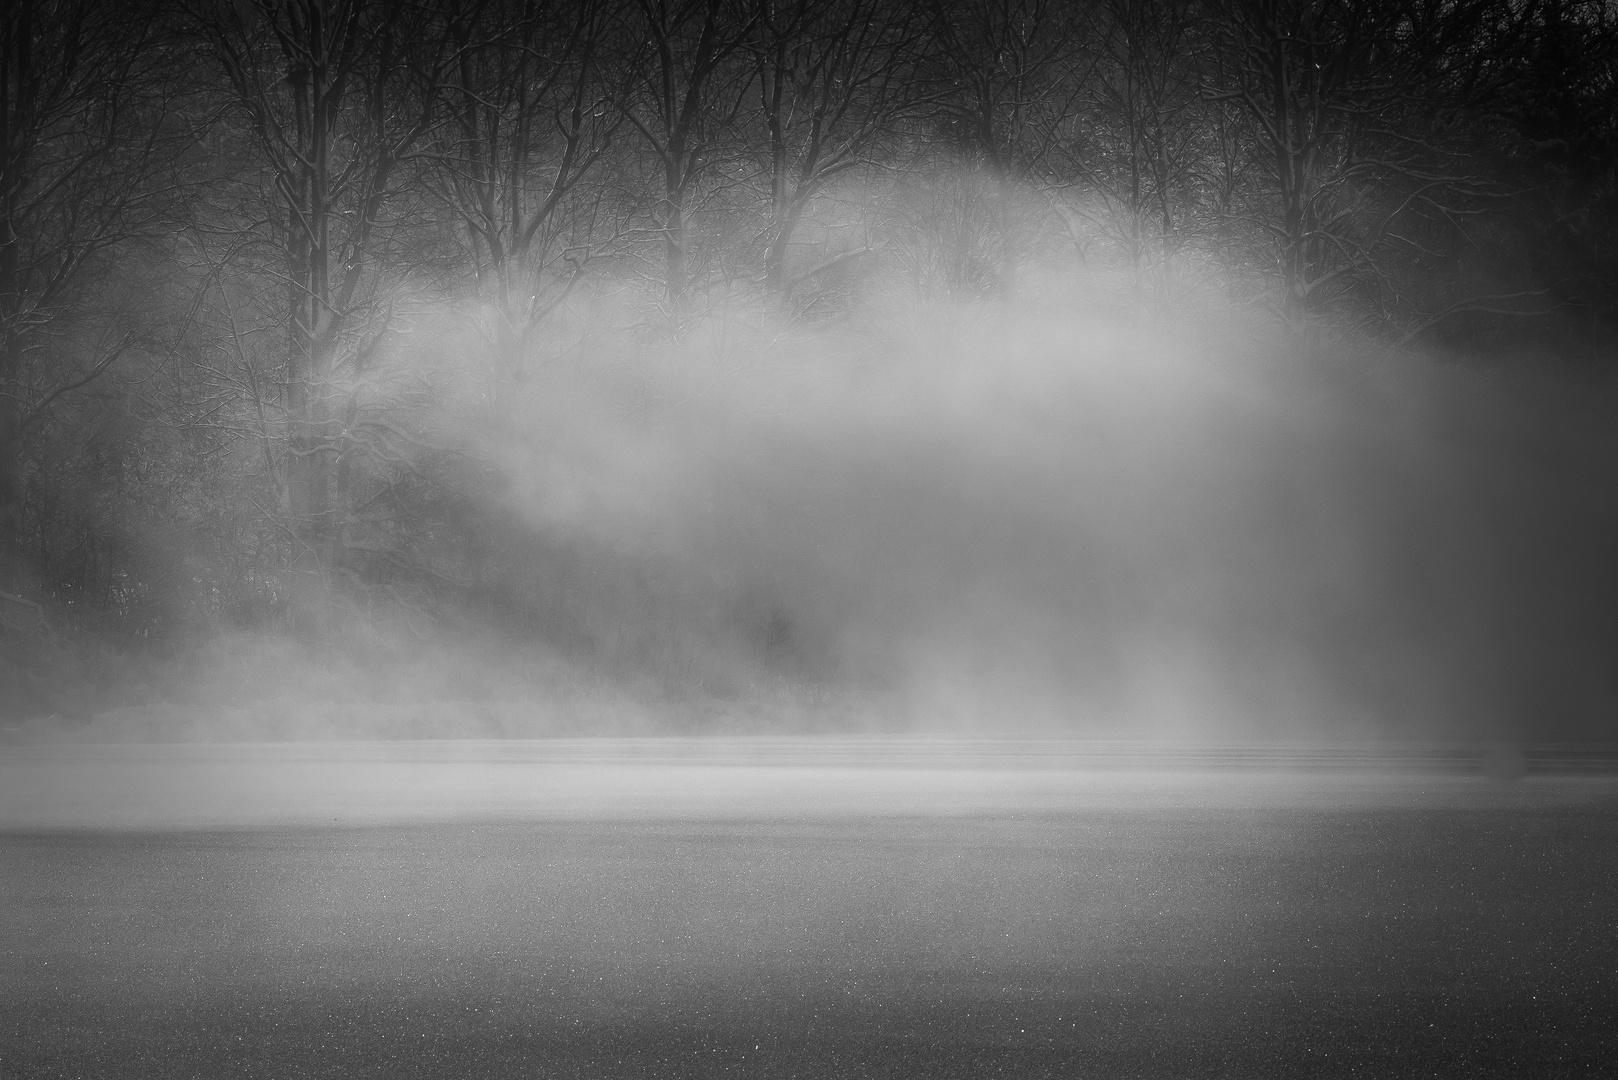 Nebelschwaden über dem Eis